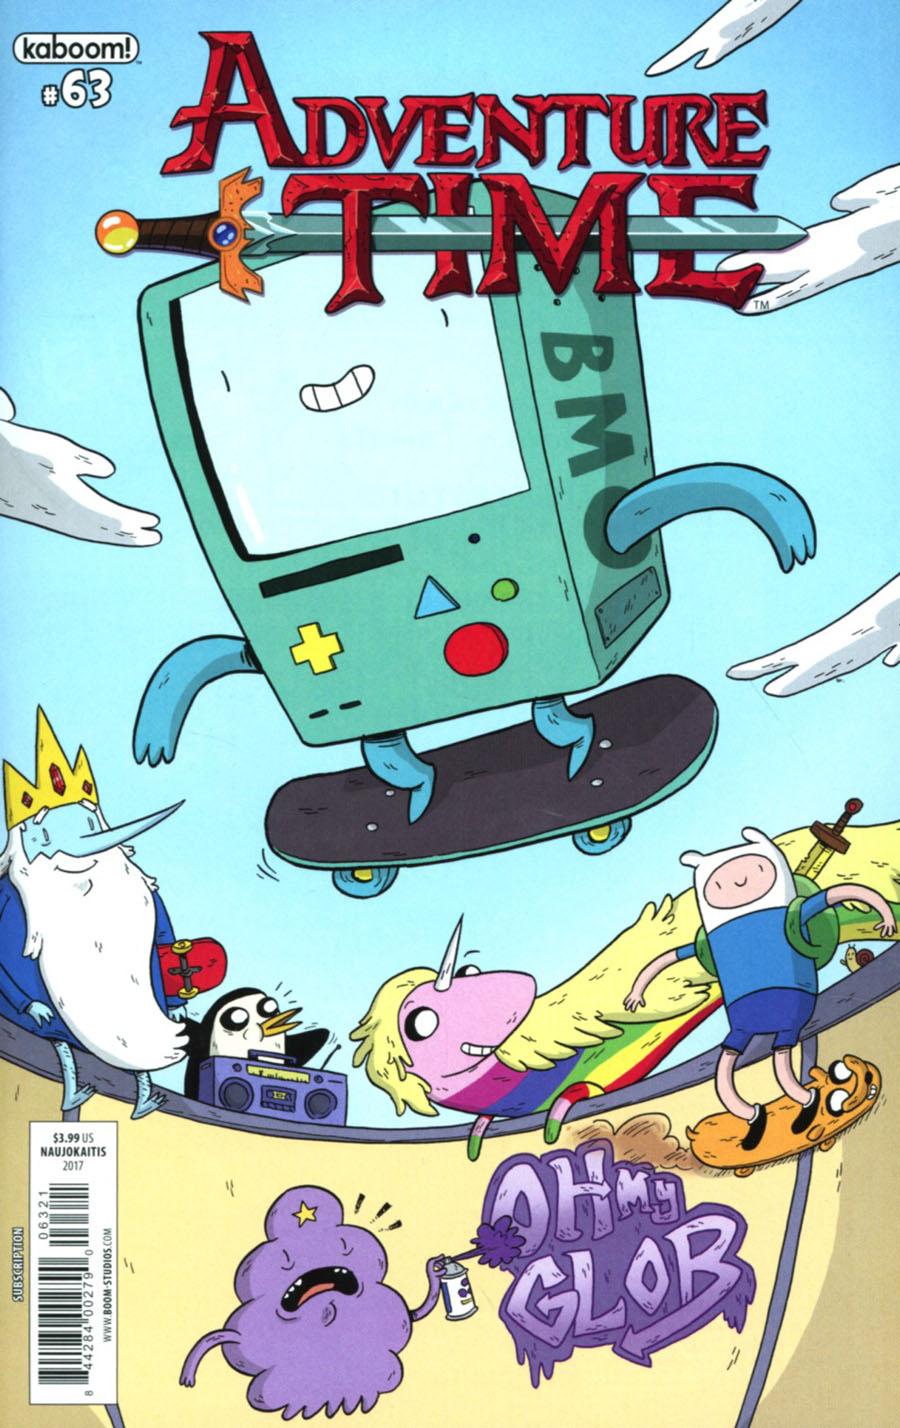 Adventure Time #63 Cover B Variant Pranas Naujokaitis Subscription Cover